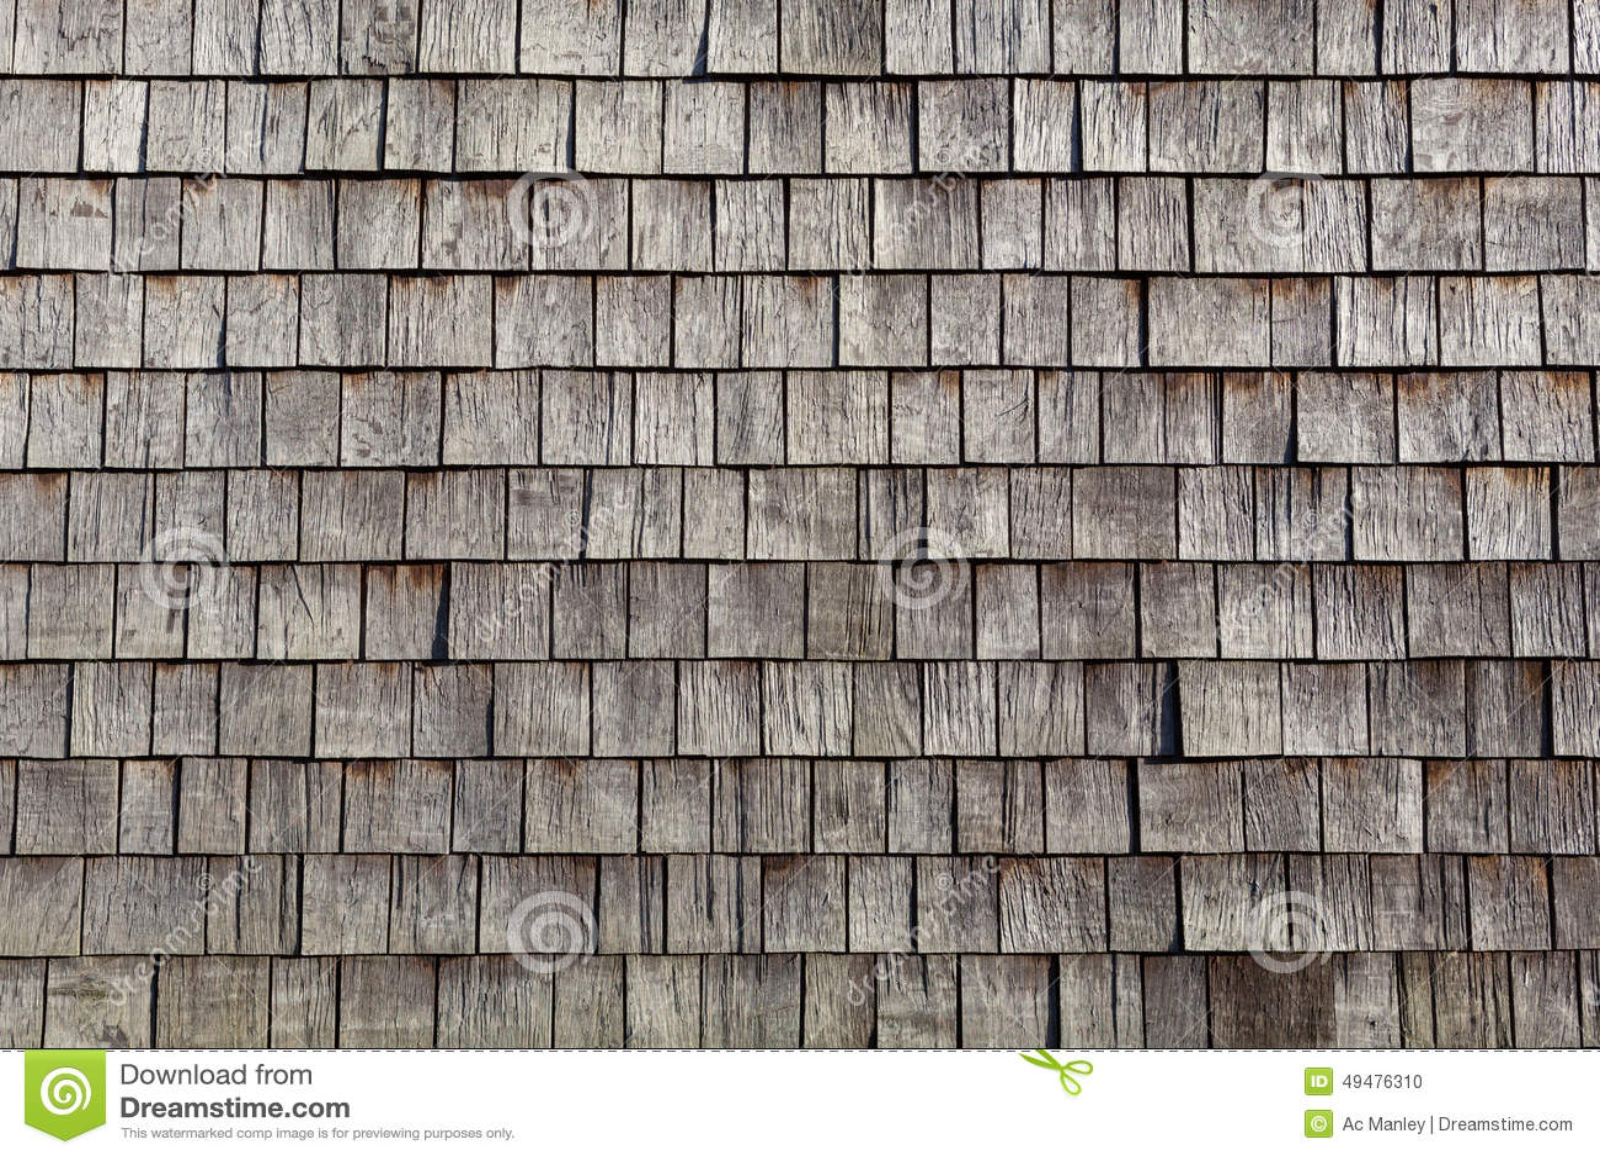 Wooden Single Tiles Stock Photo - Image: 49476310